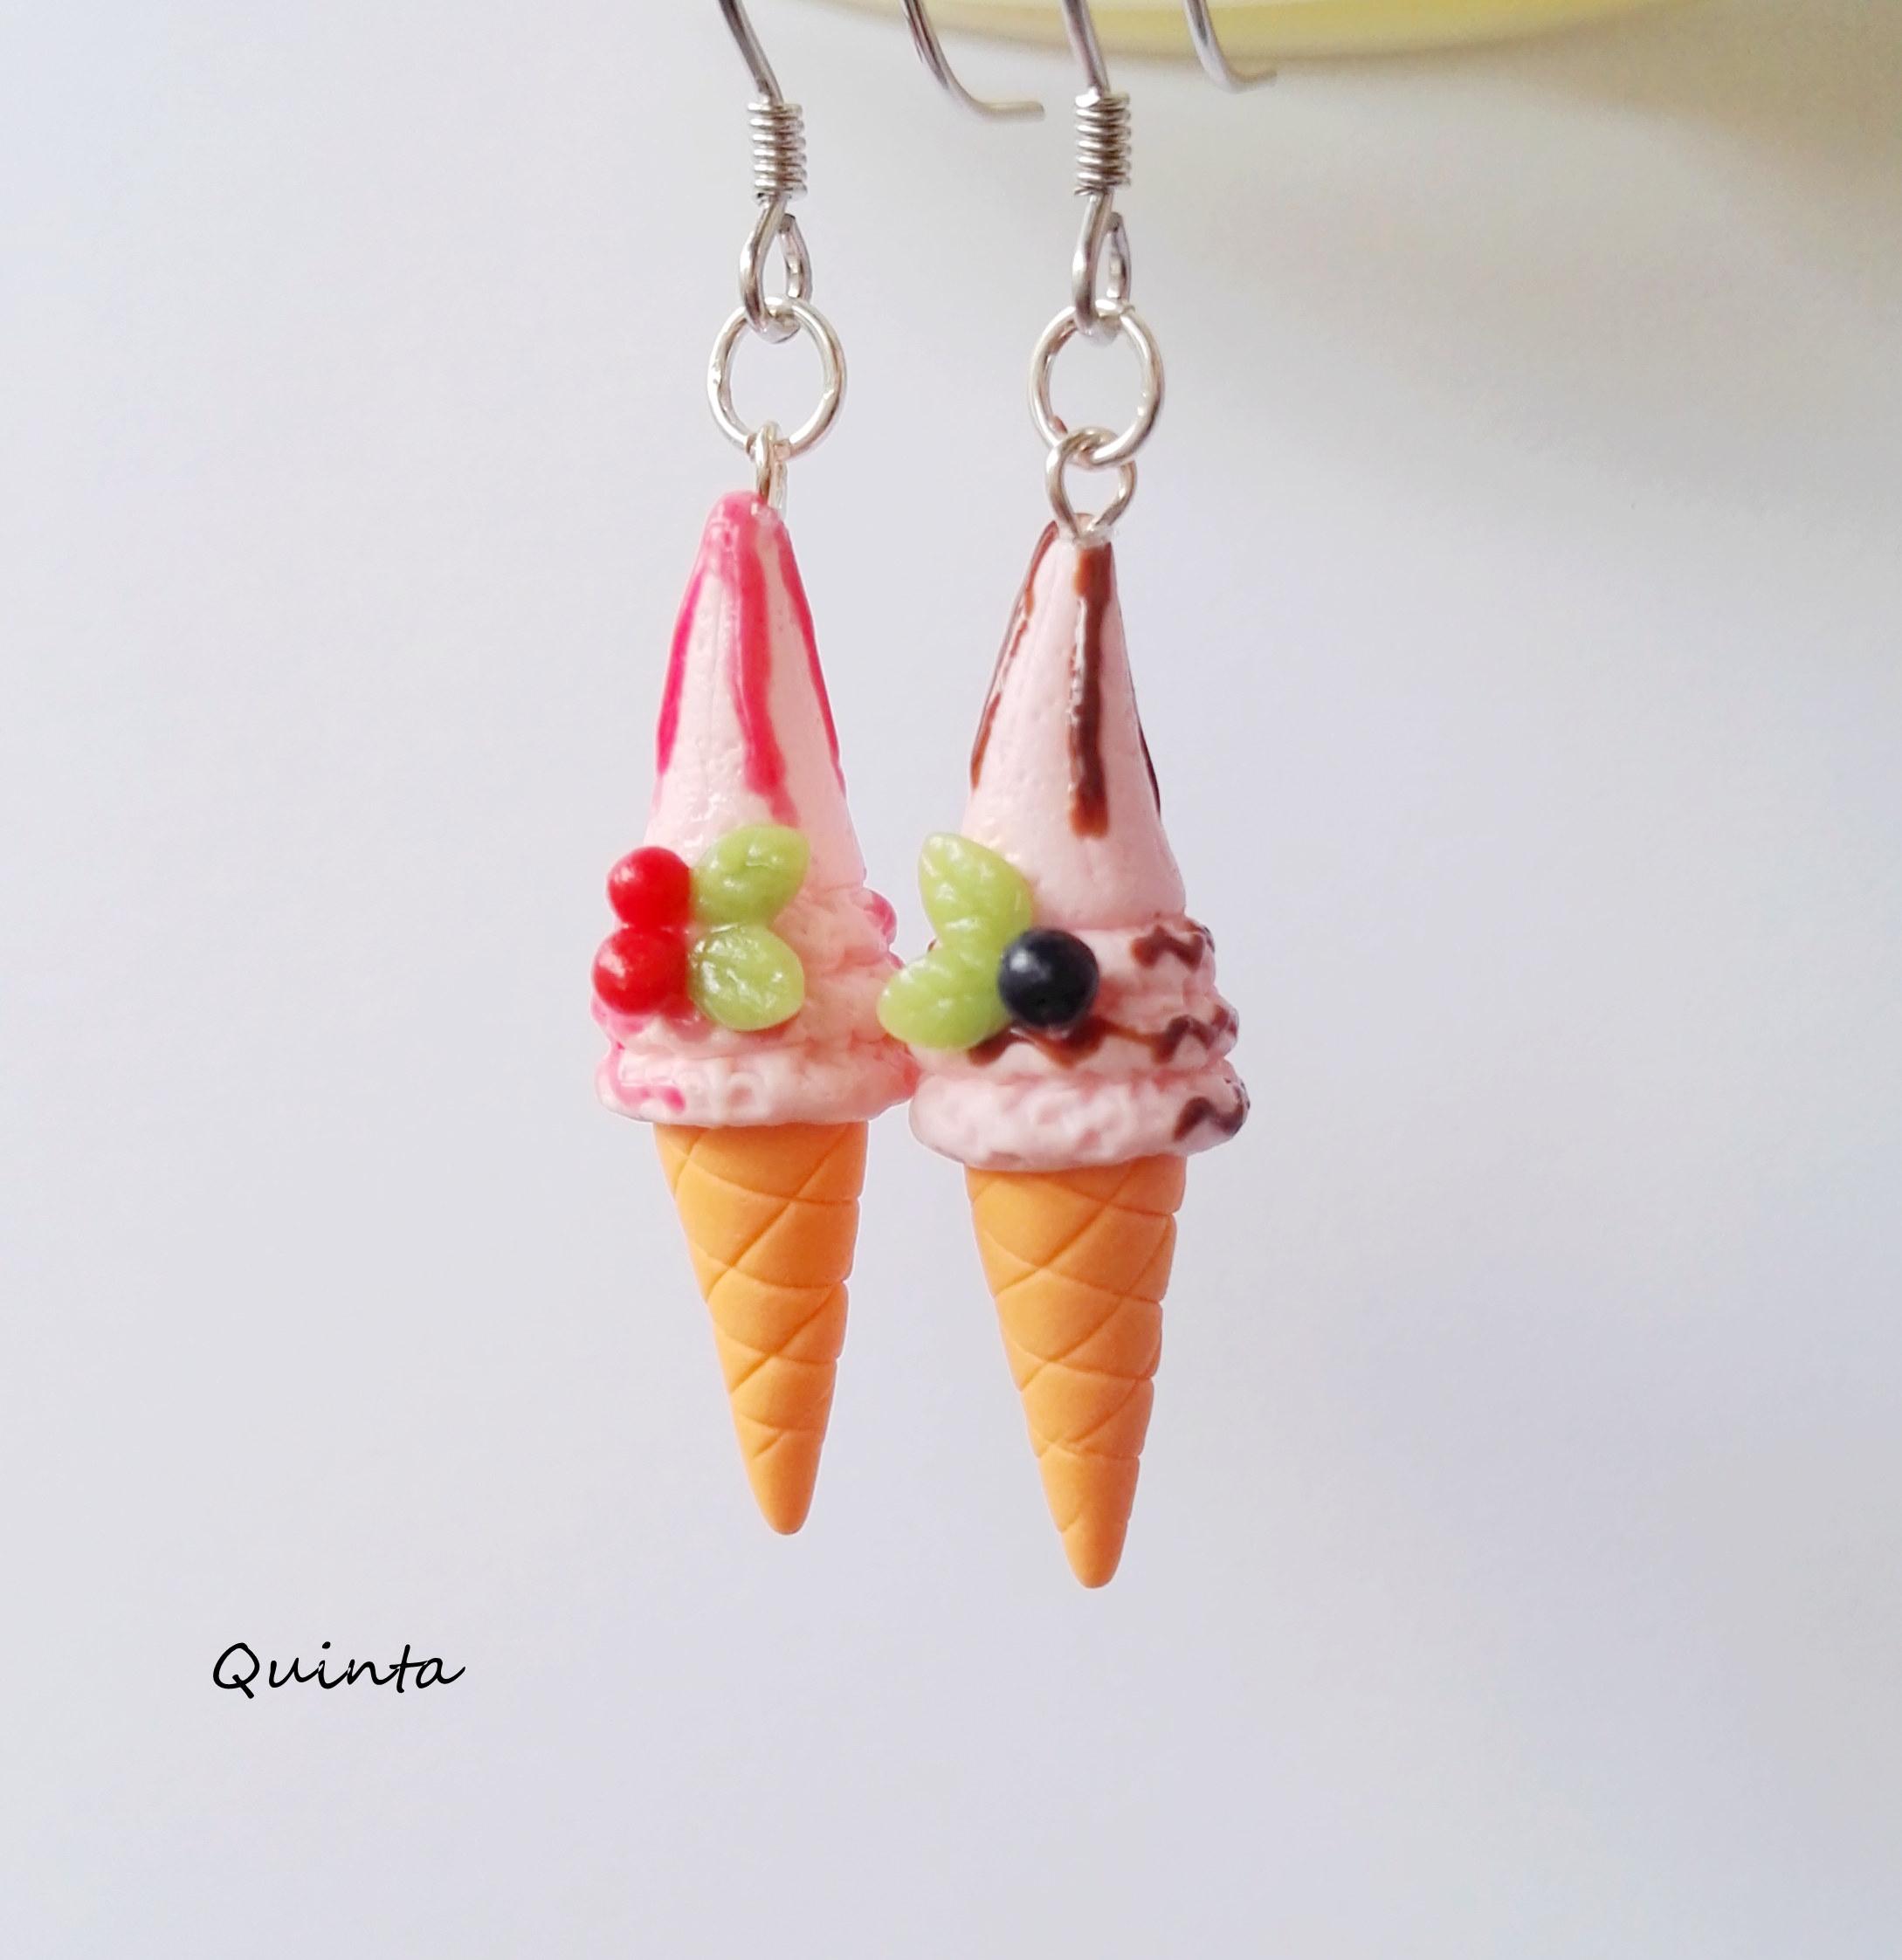 Quinta原创手作草莓冰淇淋牛奶冰淇淋925银耳环耳夹可爱萌系